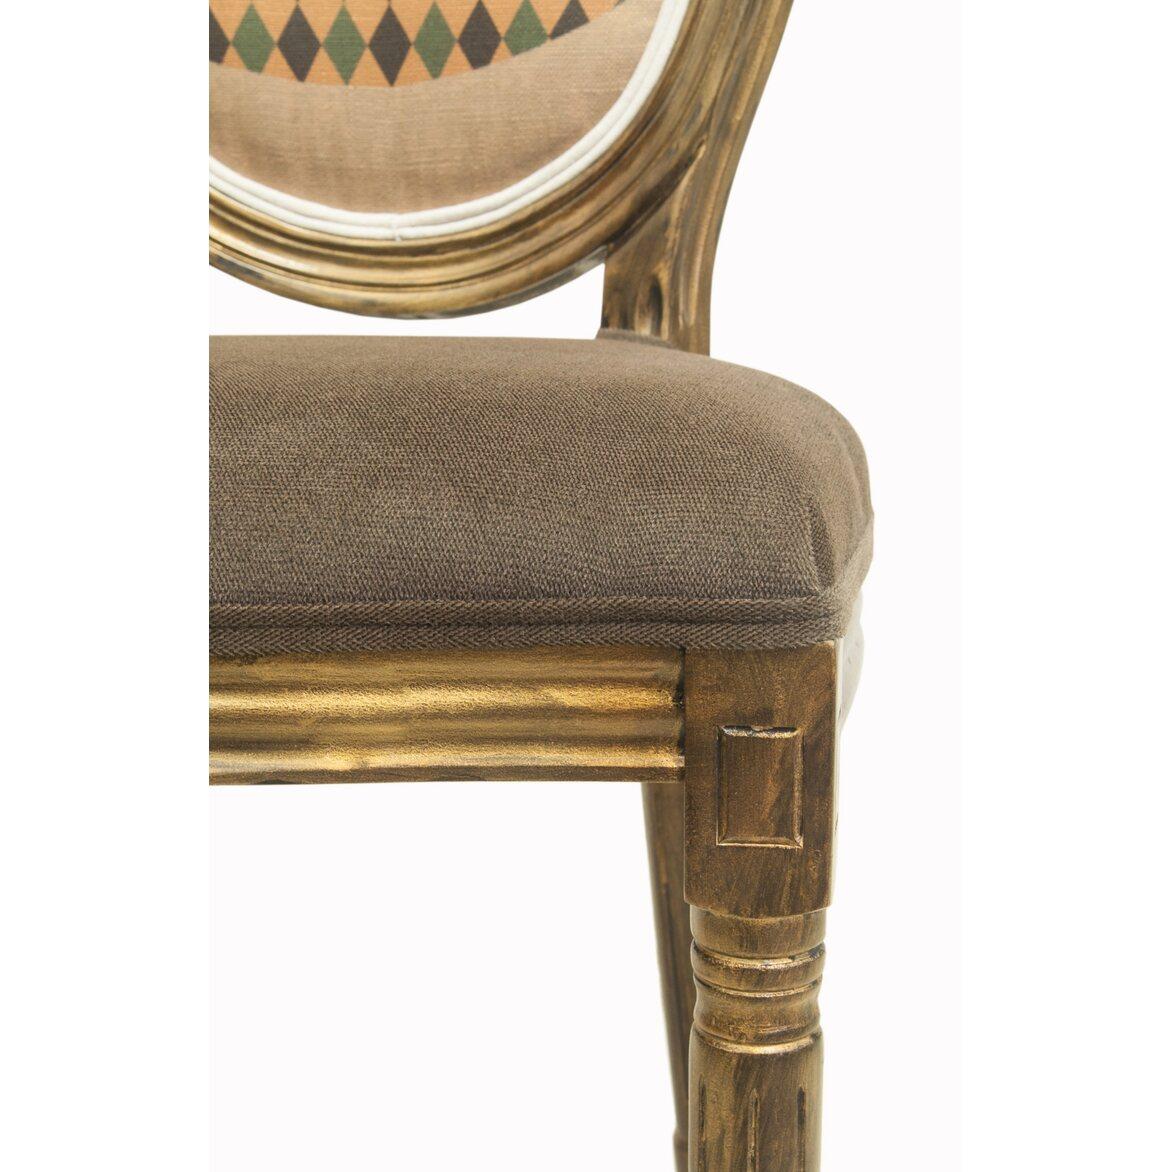 Стул Volker brown bear 5 | Обеденные стулья Kingsby